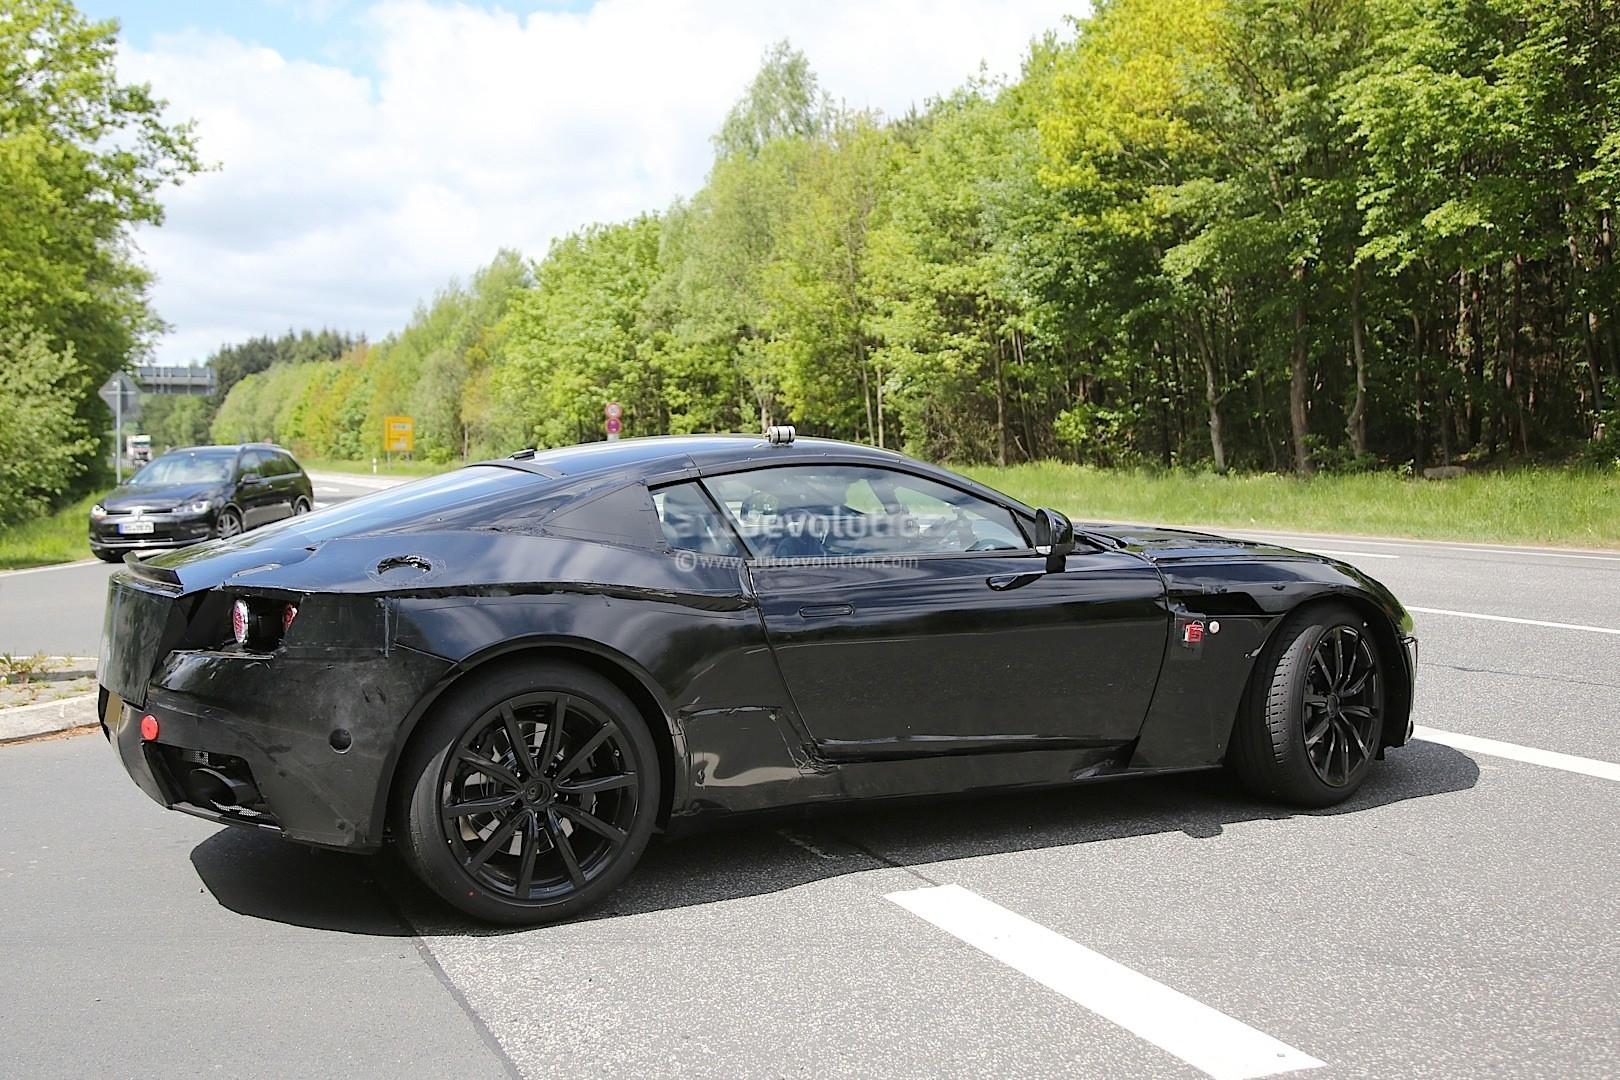 2016 - [Aston Martin] DB11 Aston-martin-db9-successor-db11-spied-to-start-the-mercedes-twin-turbo-v12-and-v8-revolution-for-aston_5